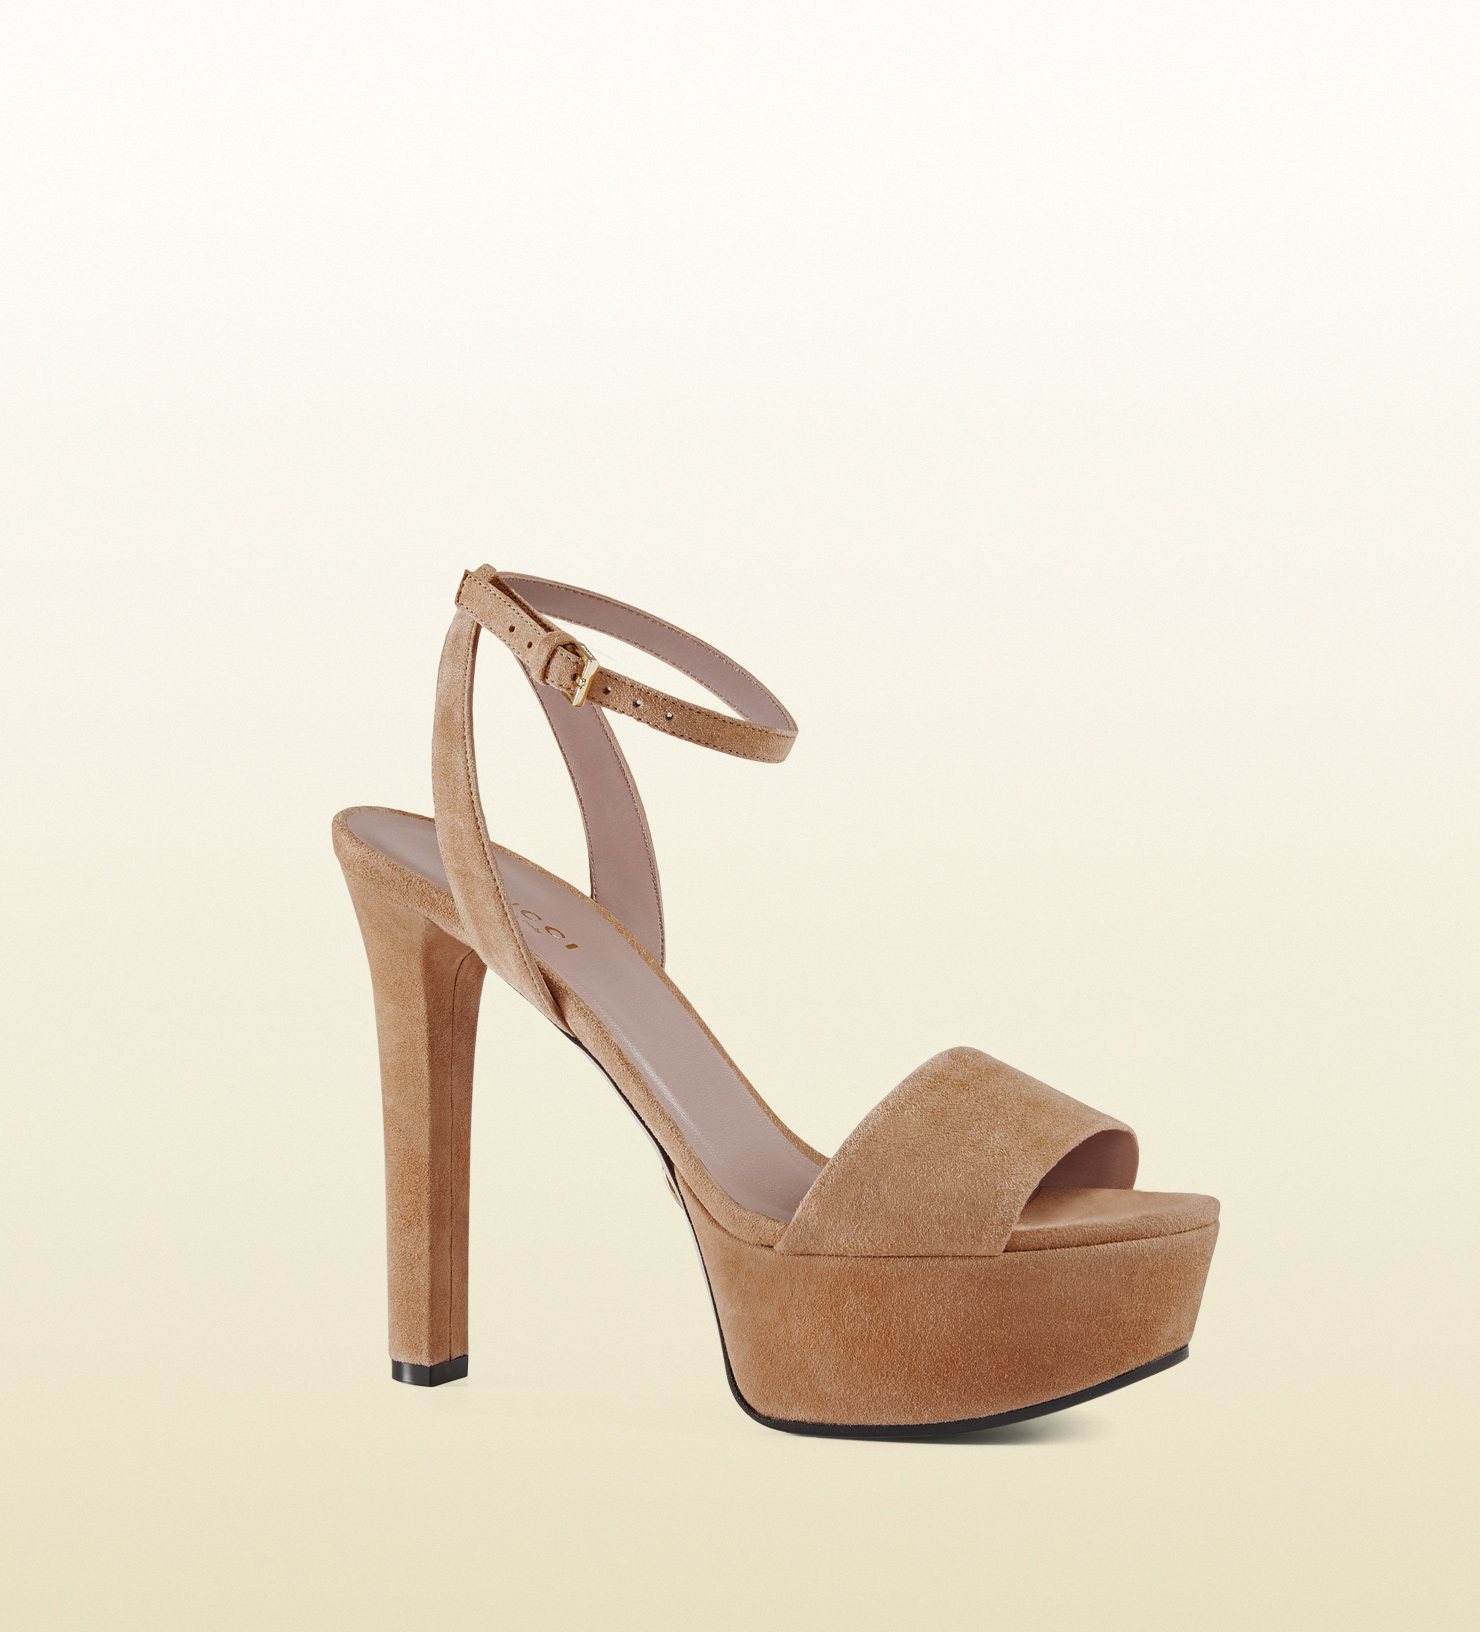 dcf029e8ebf Lyst - Gucci Leila Suede Platform Sandal in Pink